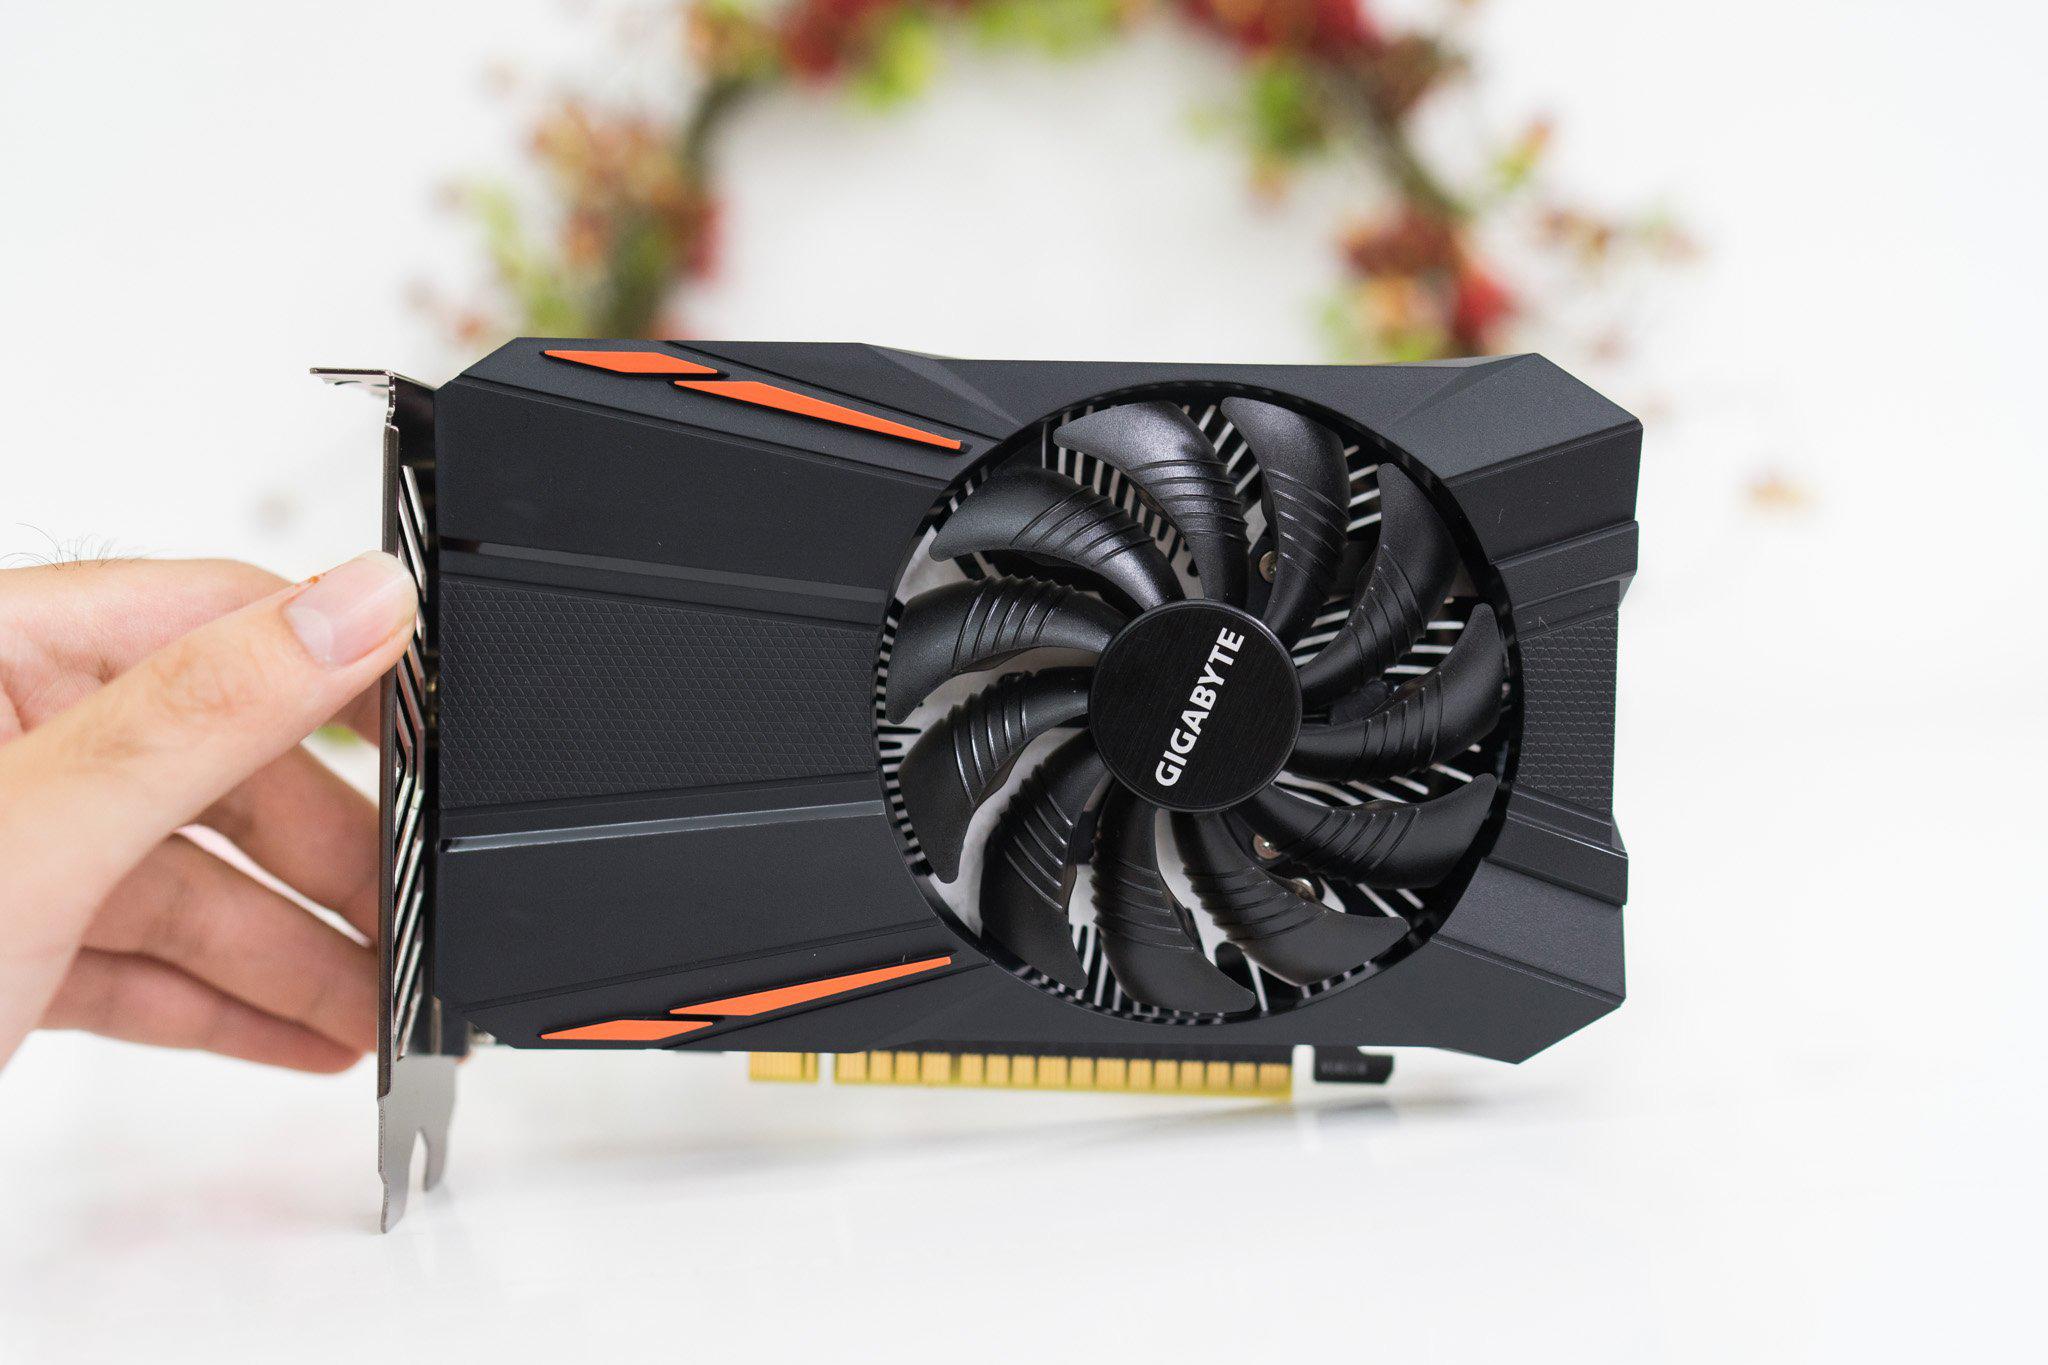 Card màn hình GIGABYTE GeForce GTX 1050 2GB GDDR5 (GV-N1050D5-2GD)